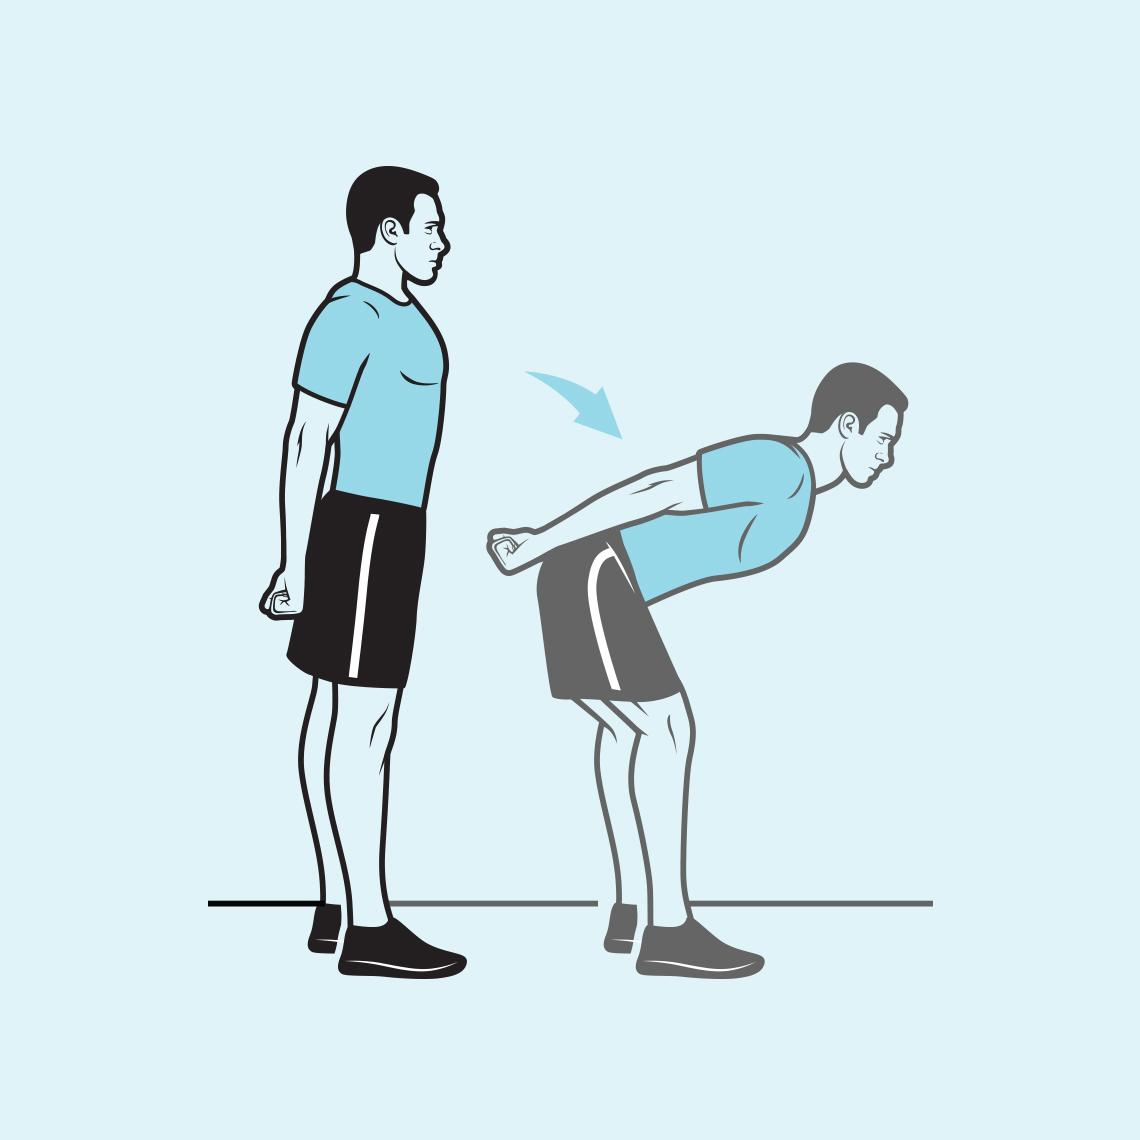 Man bending forward at hip